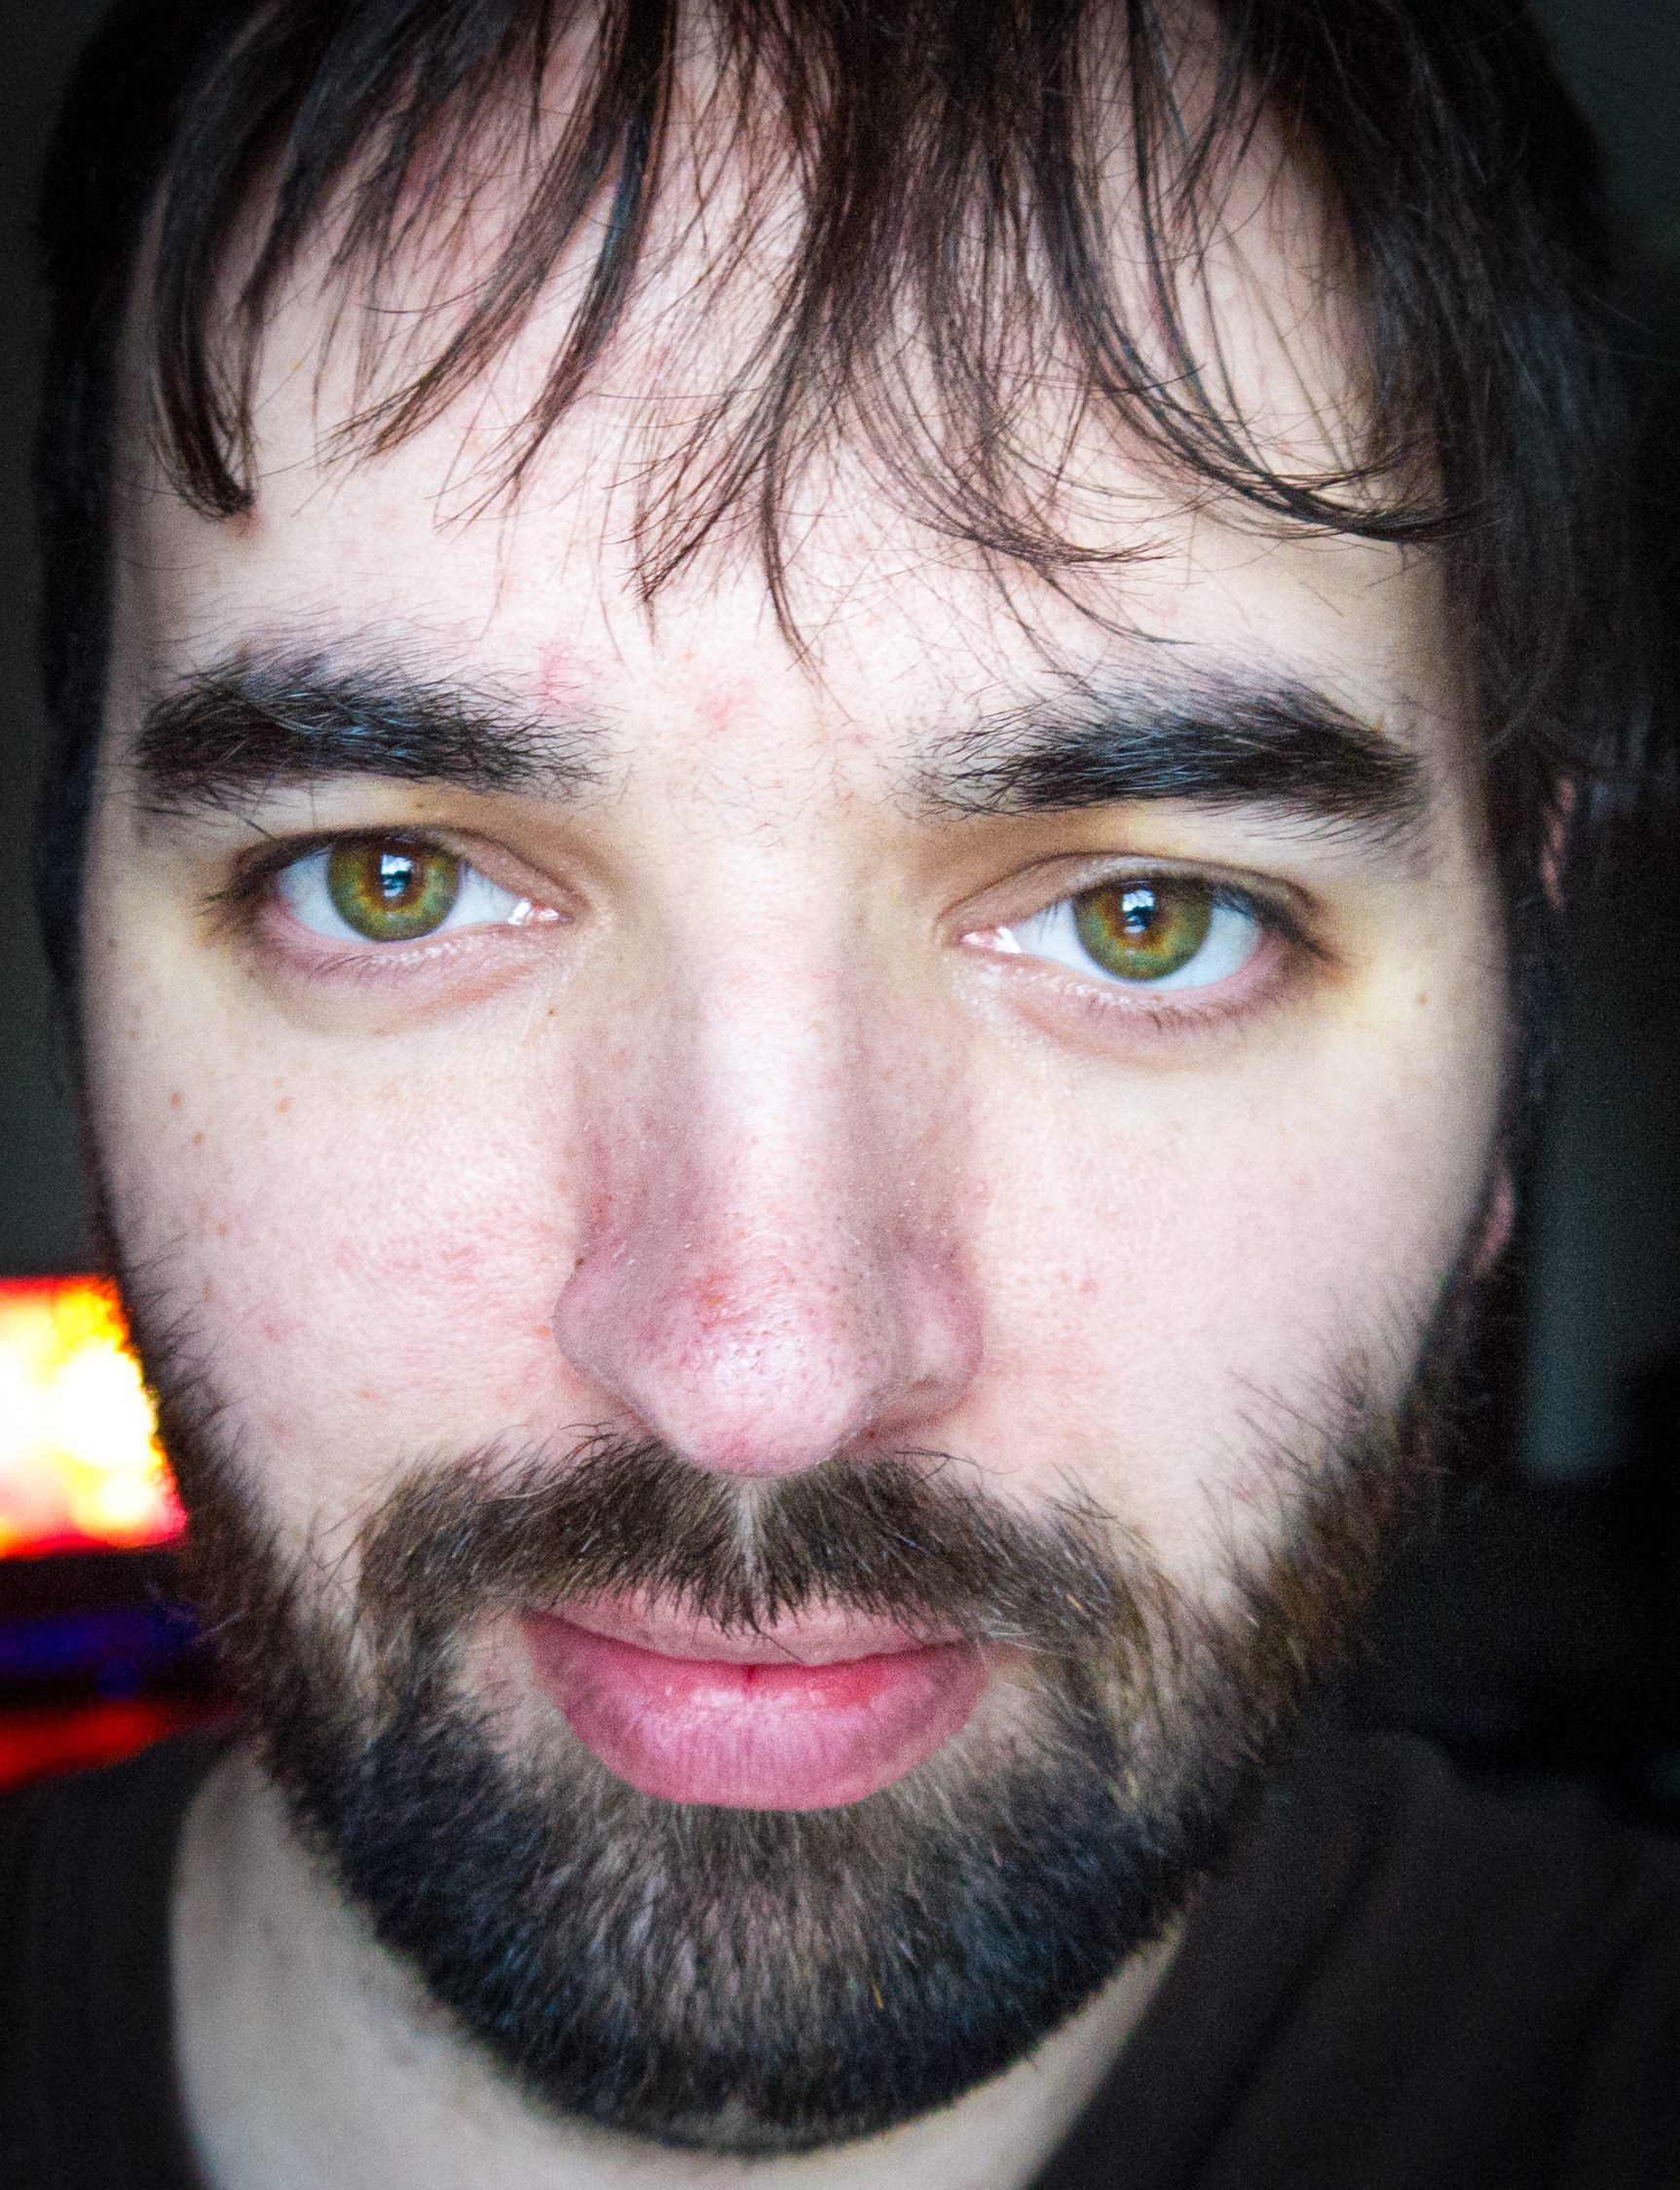 chriskronen's Profile Picture